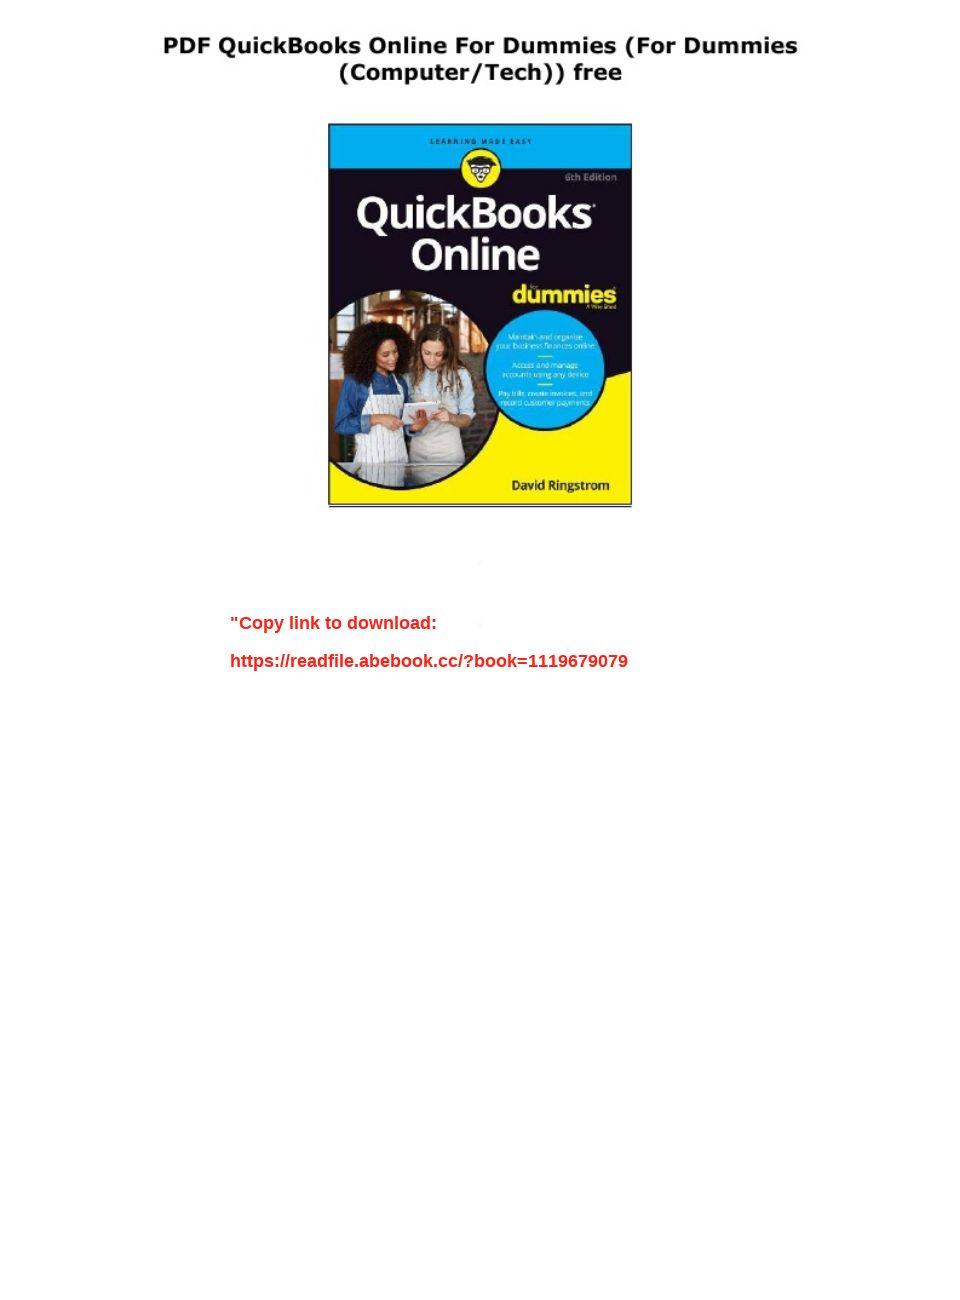 Quickbooks Online For Dummies Pdf Free